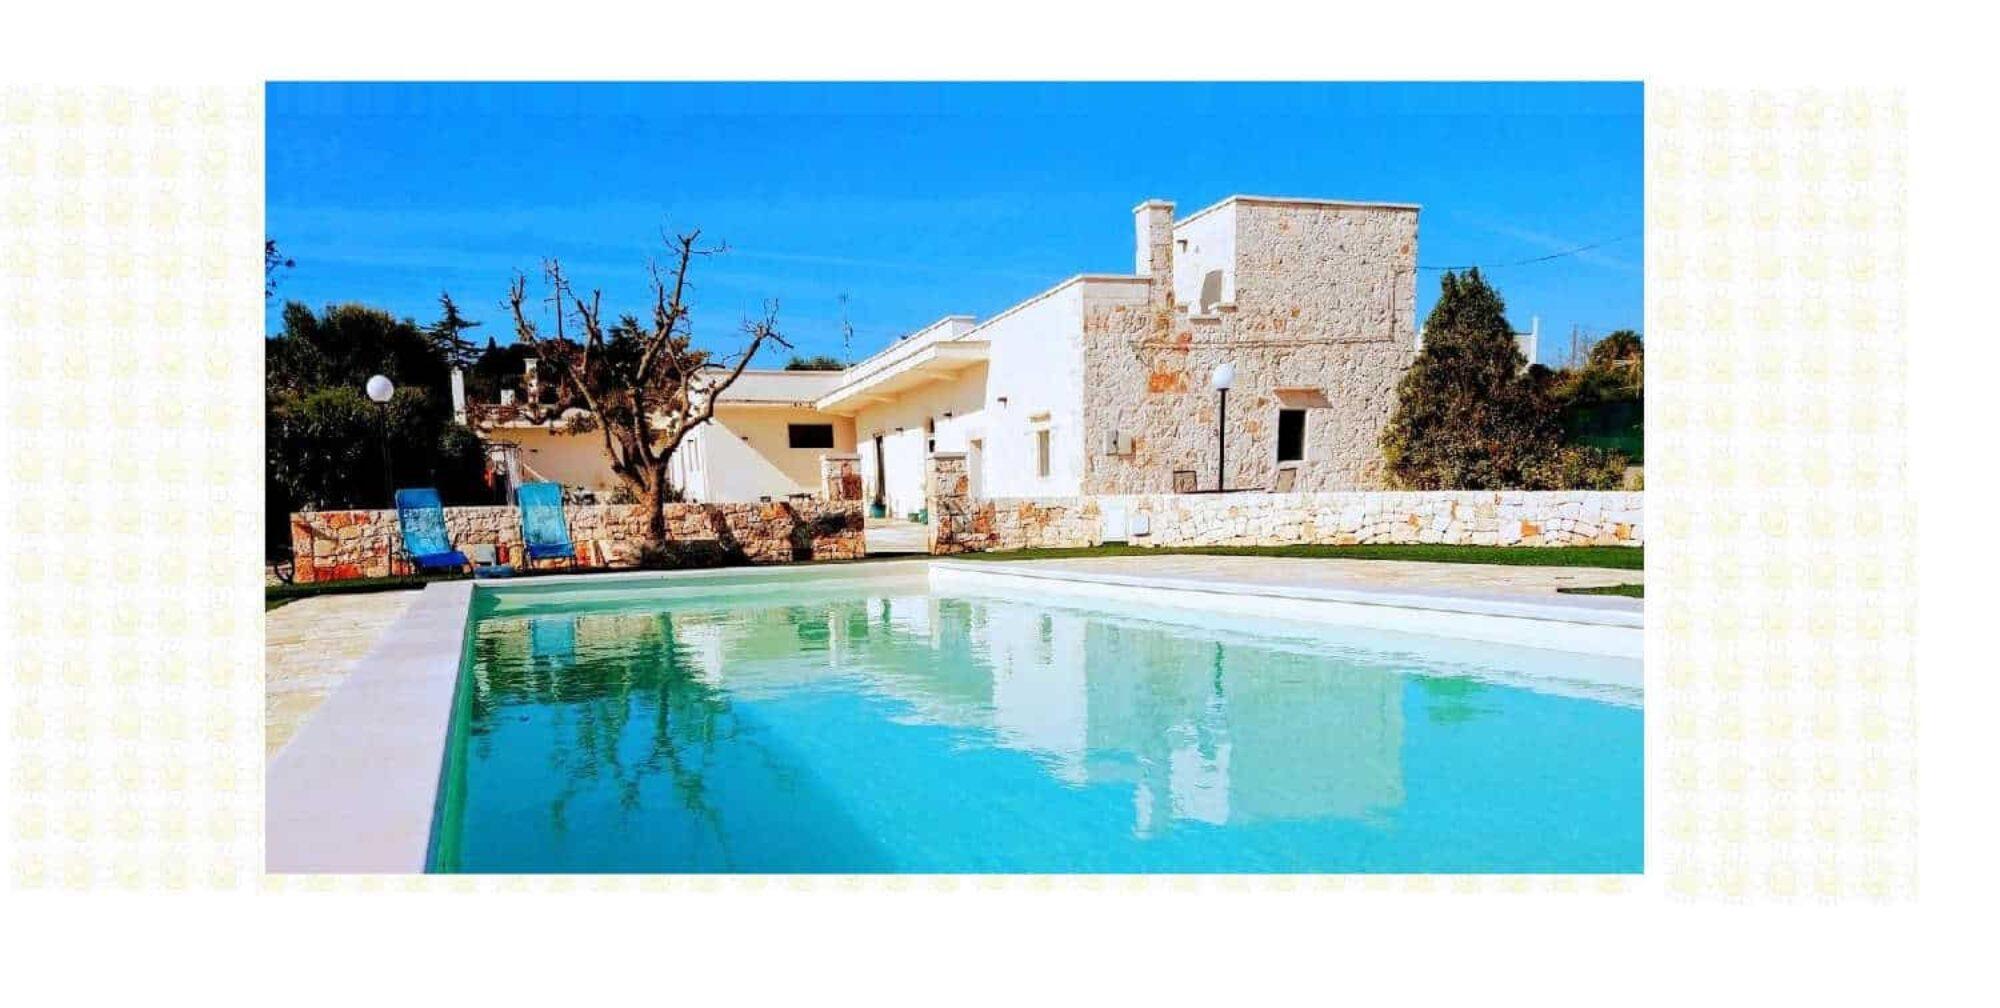 Vakantie in Puglia, Zuid-Italië